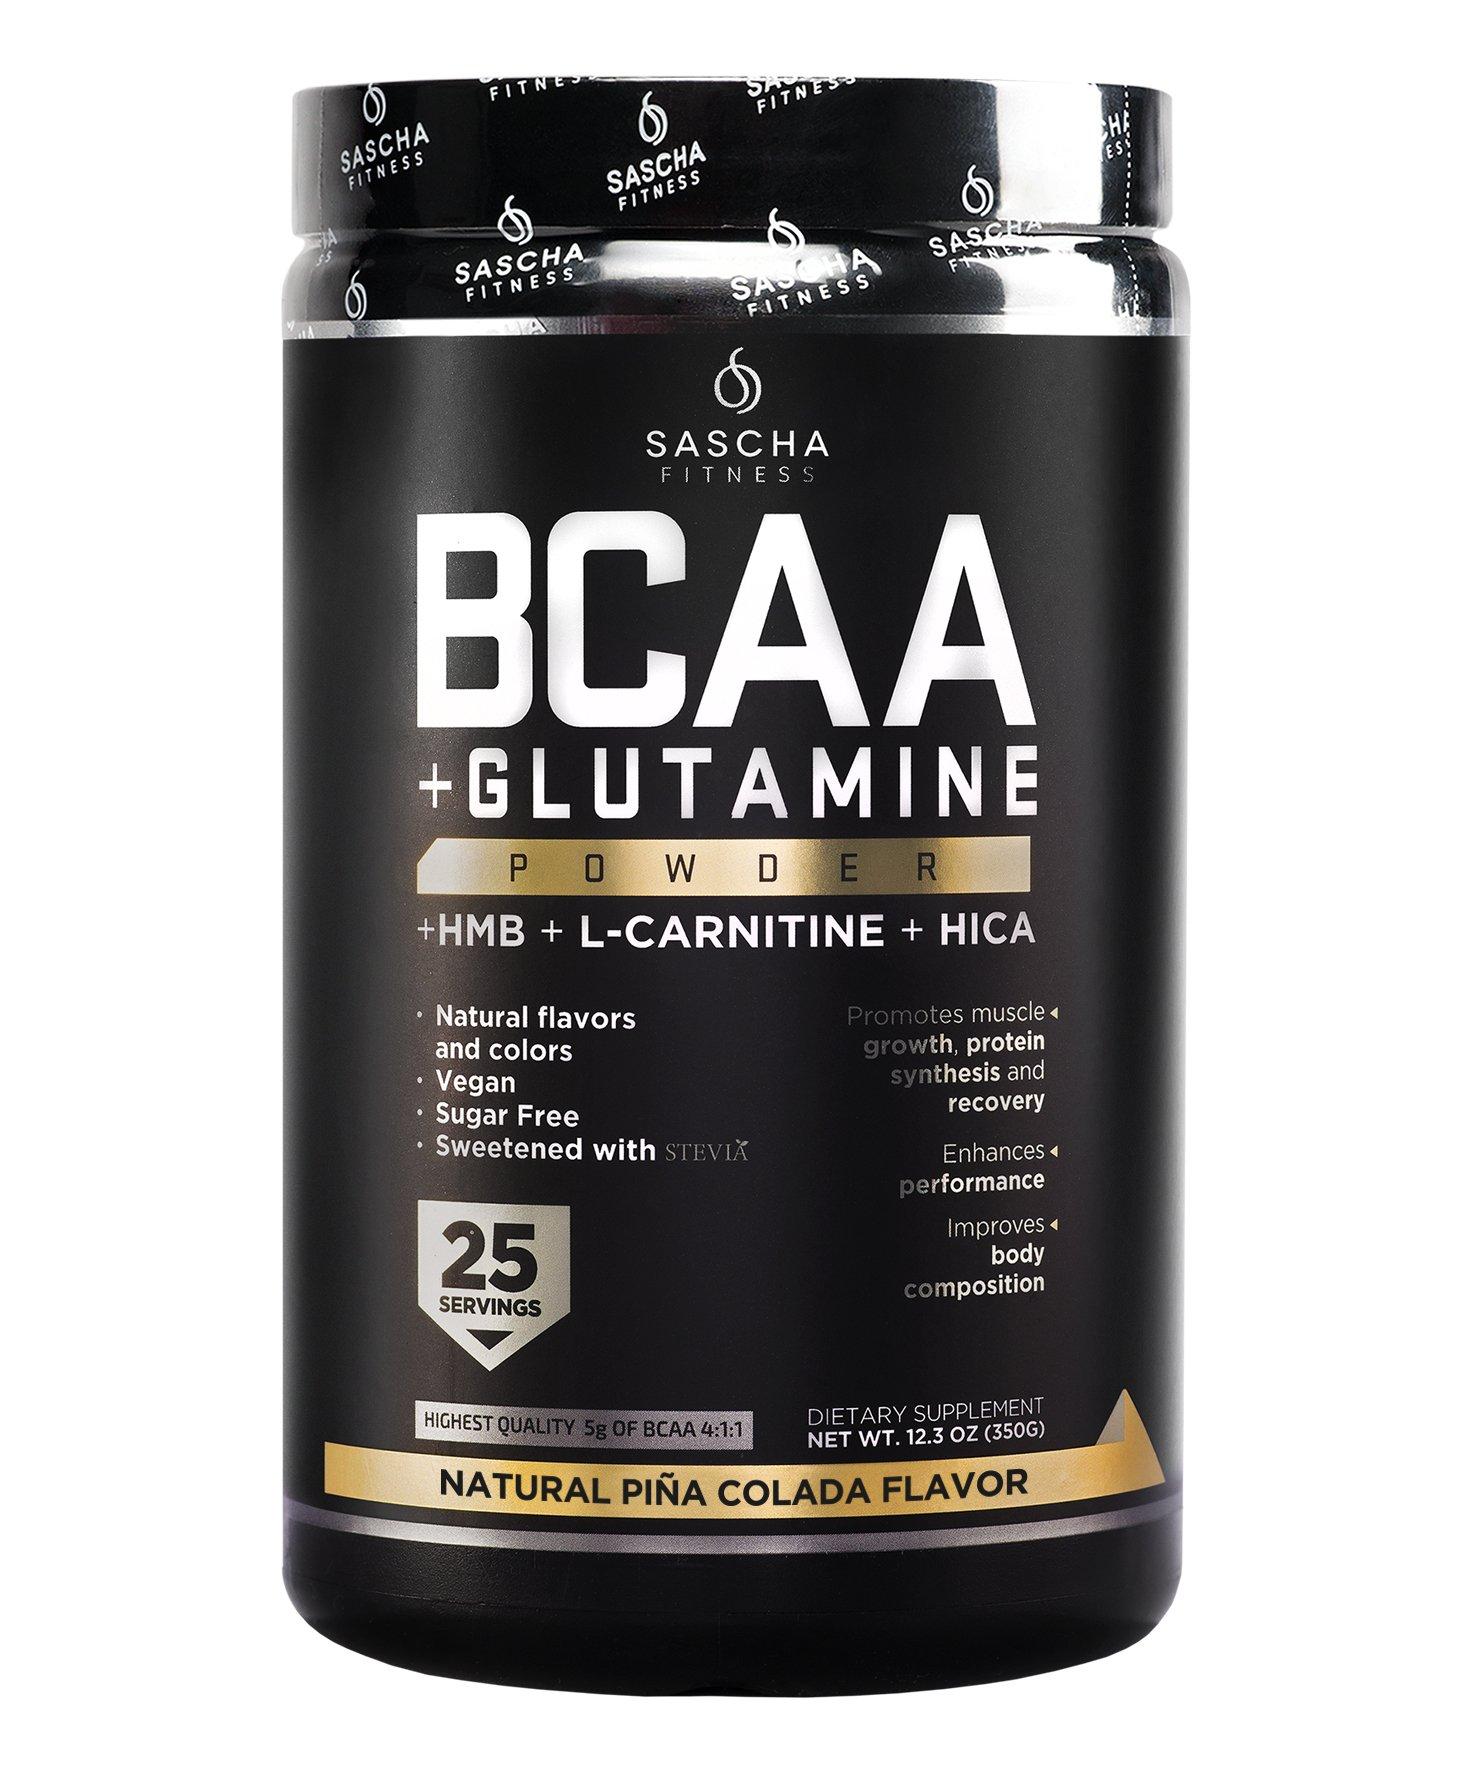 Sascha Fitness BCAA 4:1:1 + Glutamine, HMB, L-Carnitine